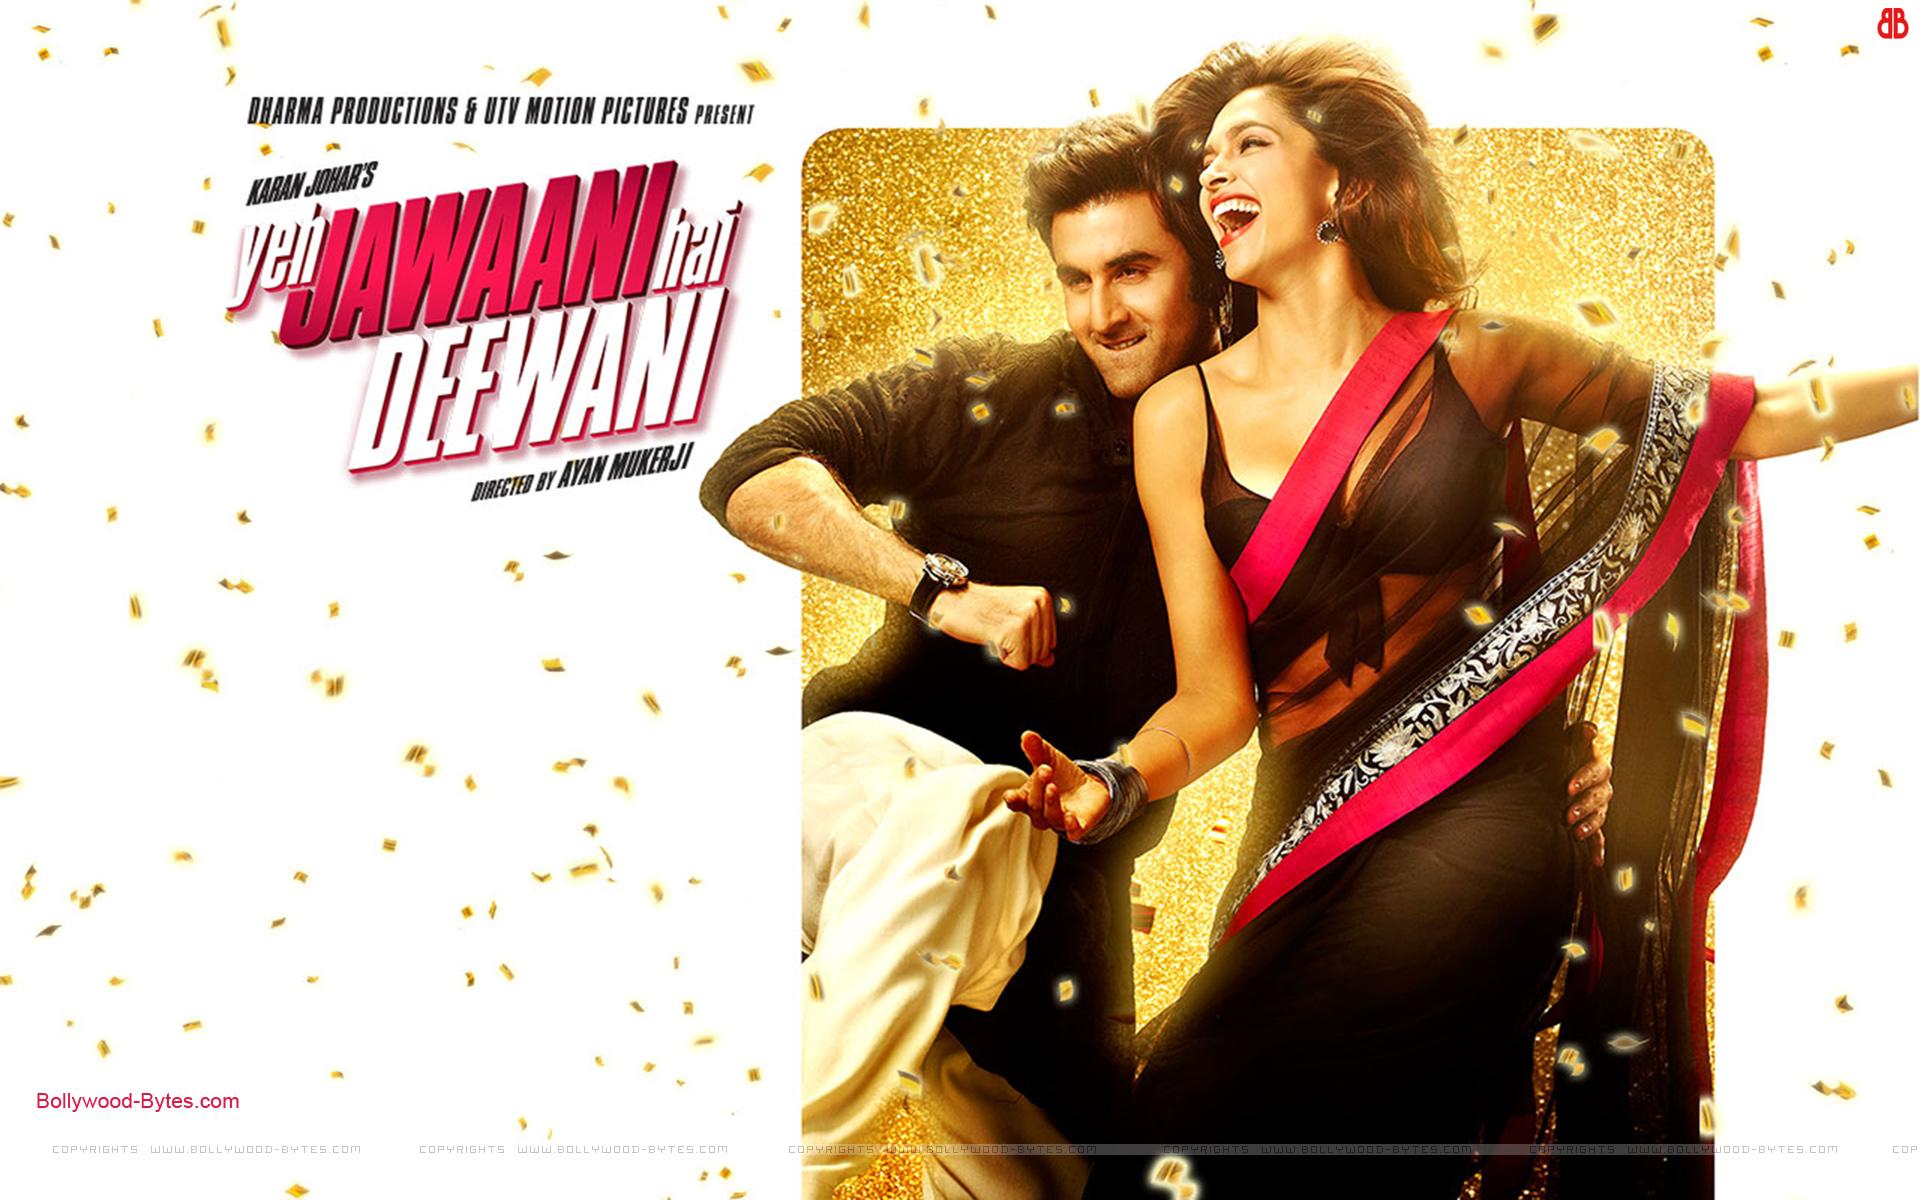 http://3.bp.blogspot.com/-2182-jiG_iE/USKqqJXDiWI/AAAAAAAAbWc/JKmstPyUSt4/s1920/Yeh-Jawaani-Hai-Deewani-+Hot-Deepika-Padukone-Ranbir-Kapoor-HD-Wallpaper-01.jpg